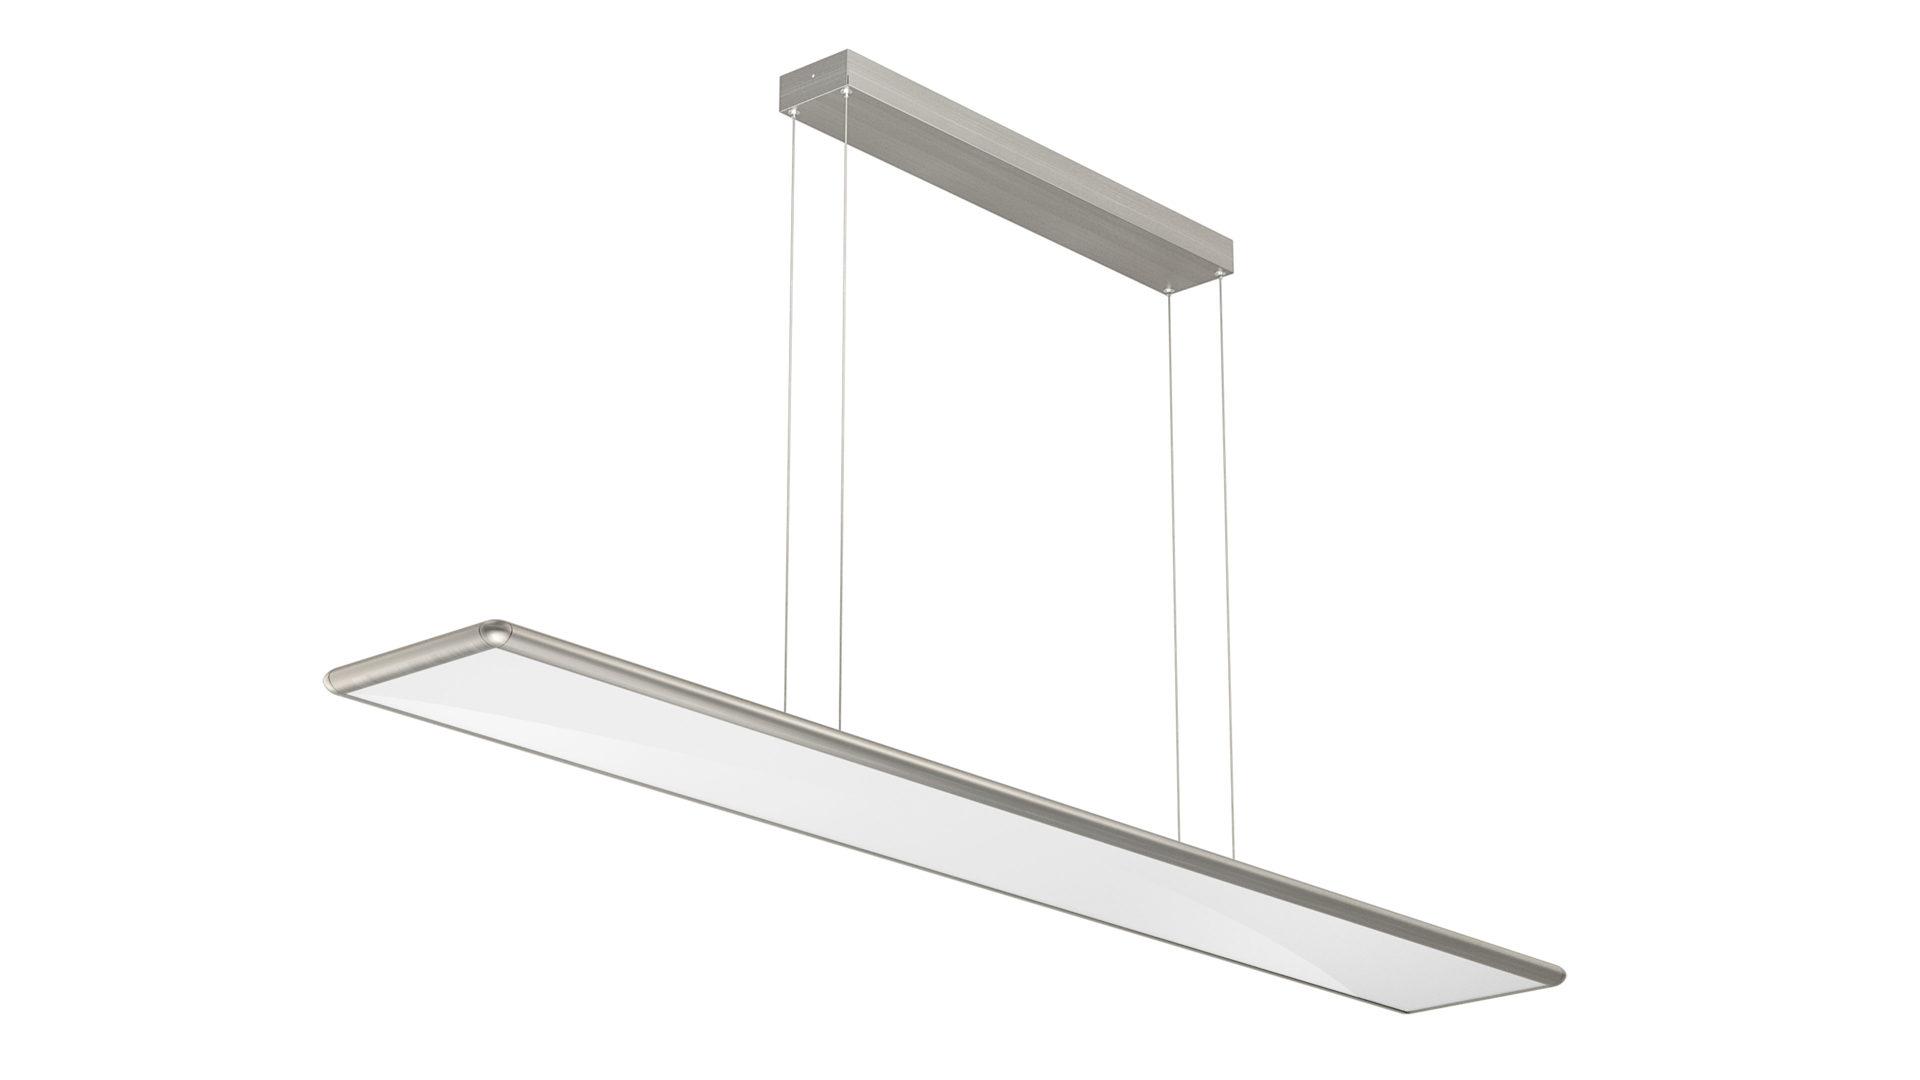 Pendelleuchte Evotec Aus Glas Metall In Metallfarben EVOTEC  LED Pendelleuchte Aluminium U0026 Nickel Gebürstet,